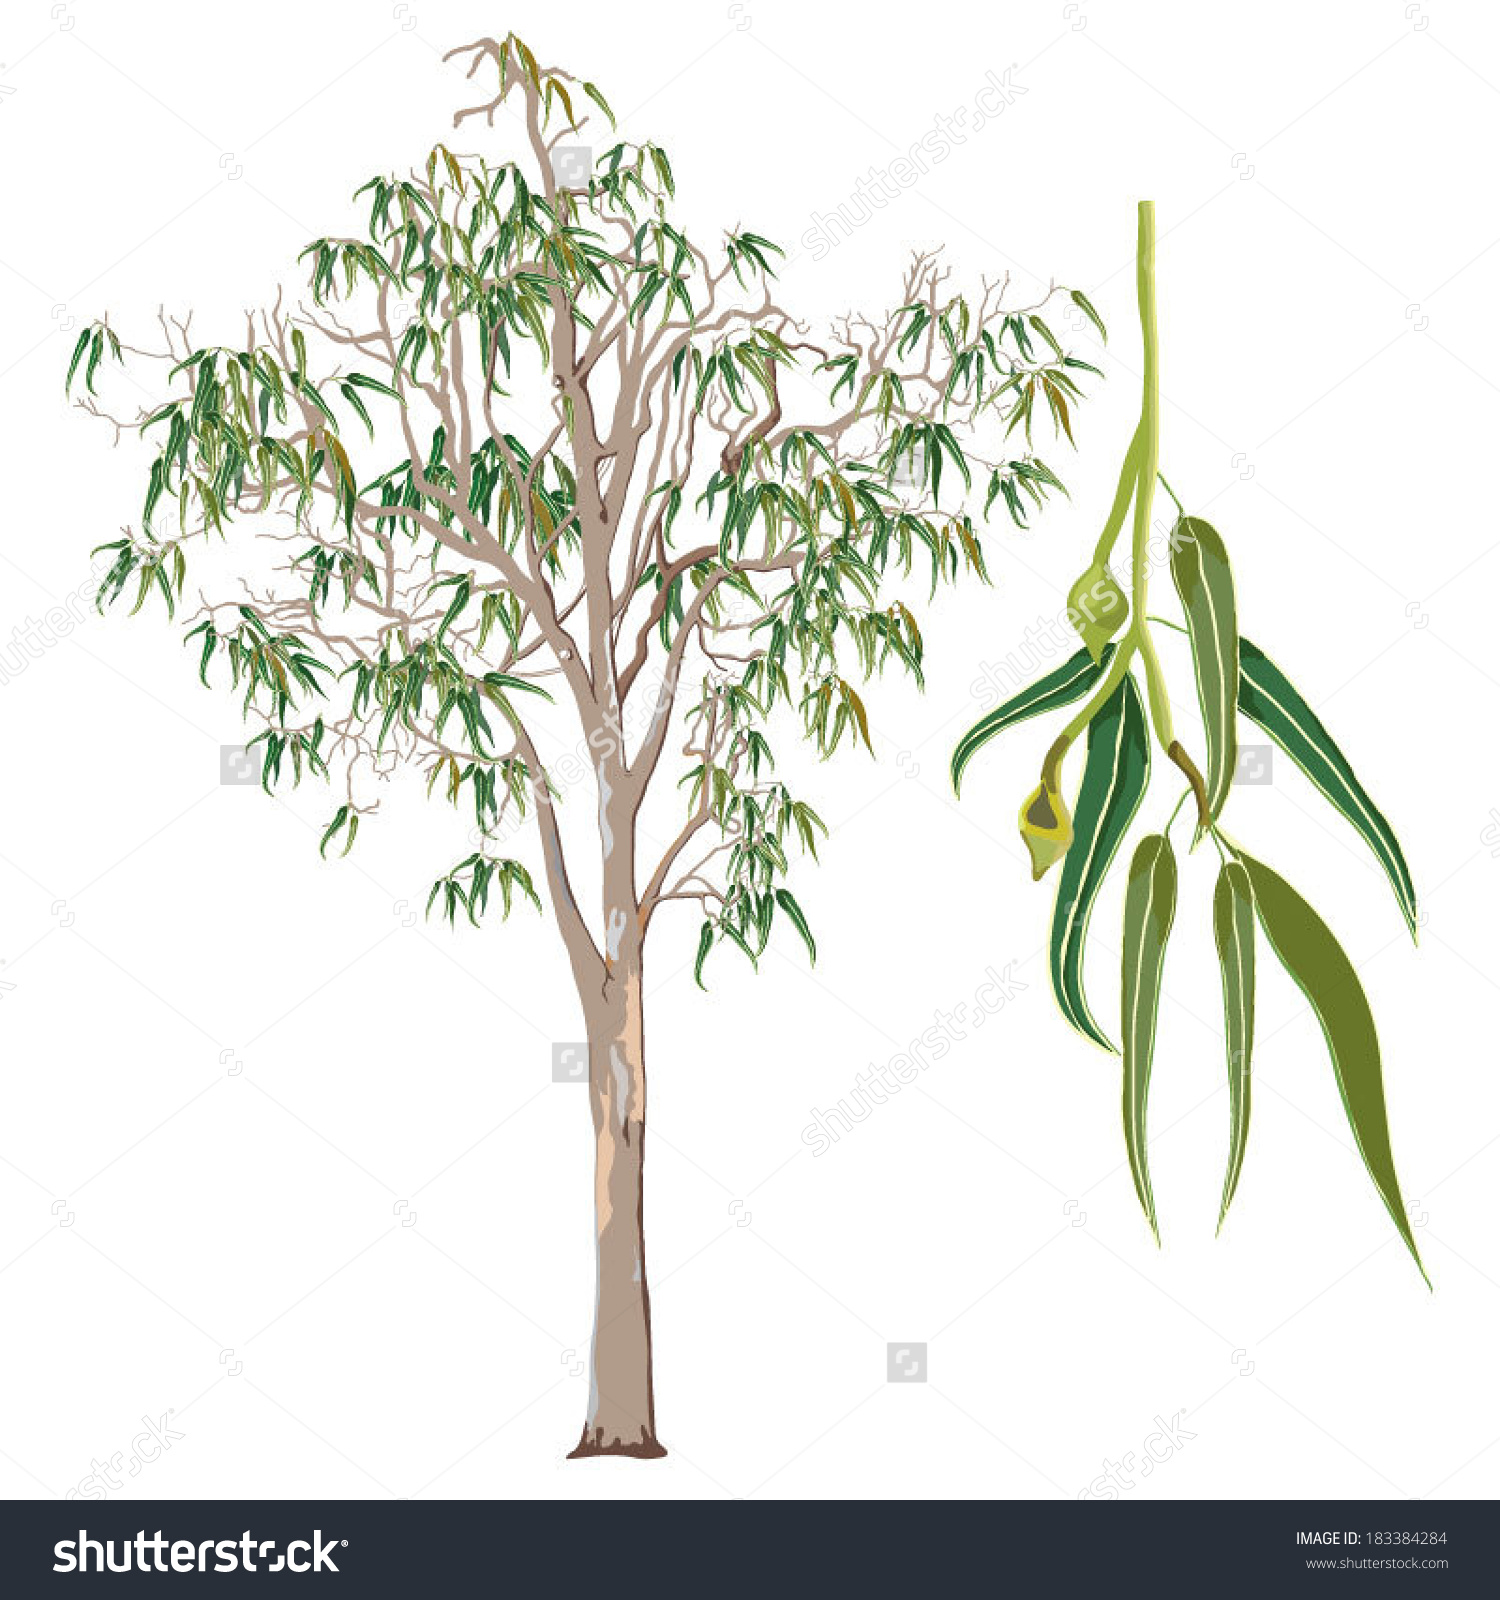 Eucalyptus Gum Tree clipart #6, Download drawings